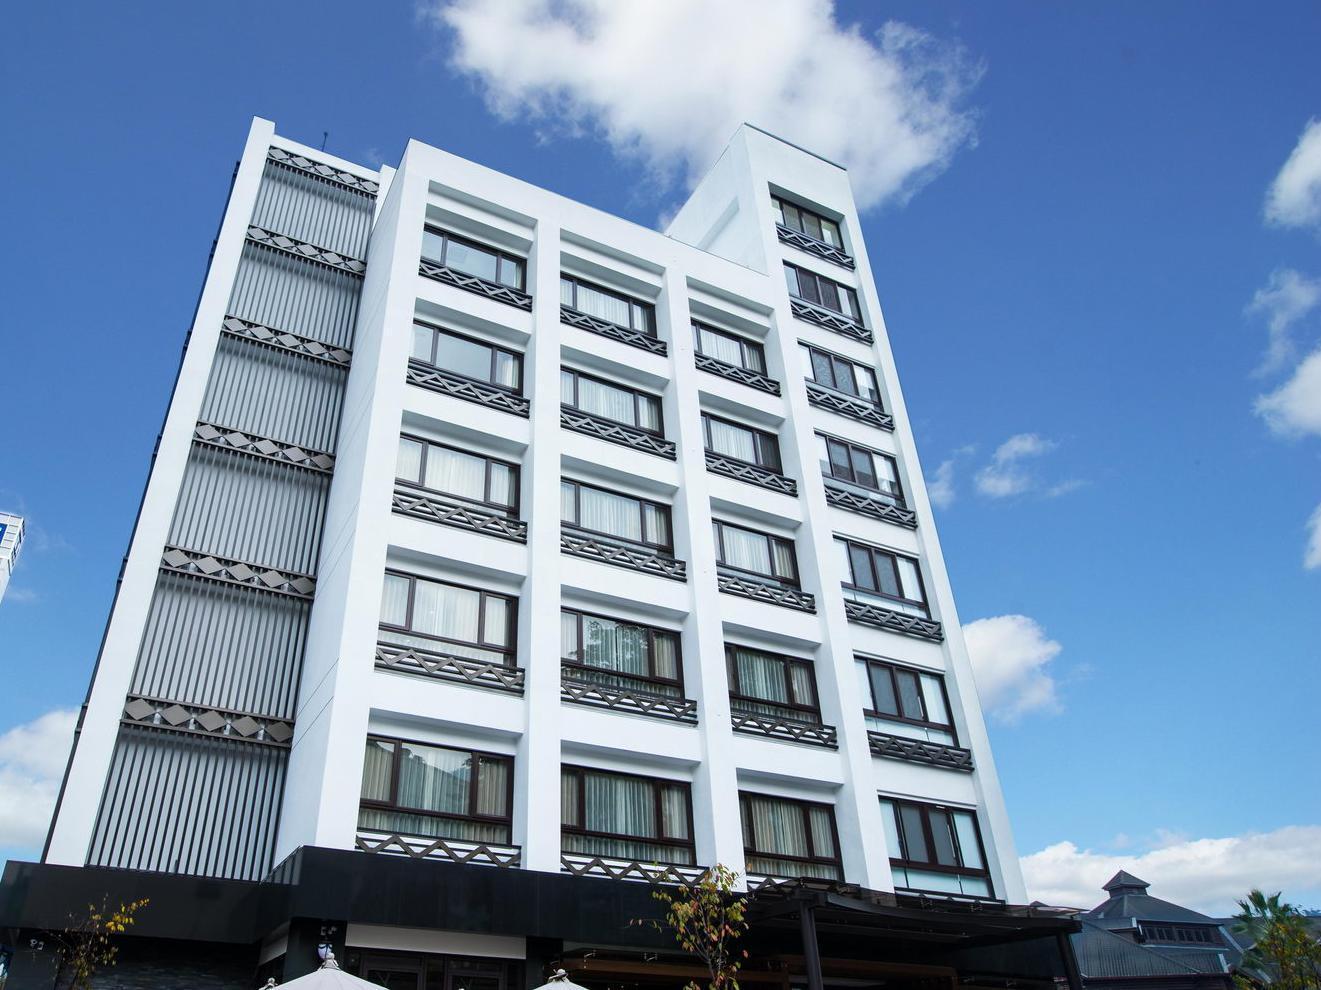 Lealea Garden Hotels - Sun Moo Lealea Garden Hotels   Sun Moo